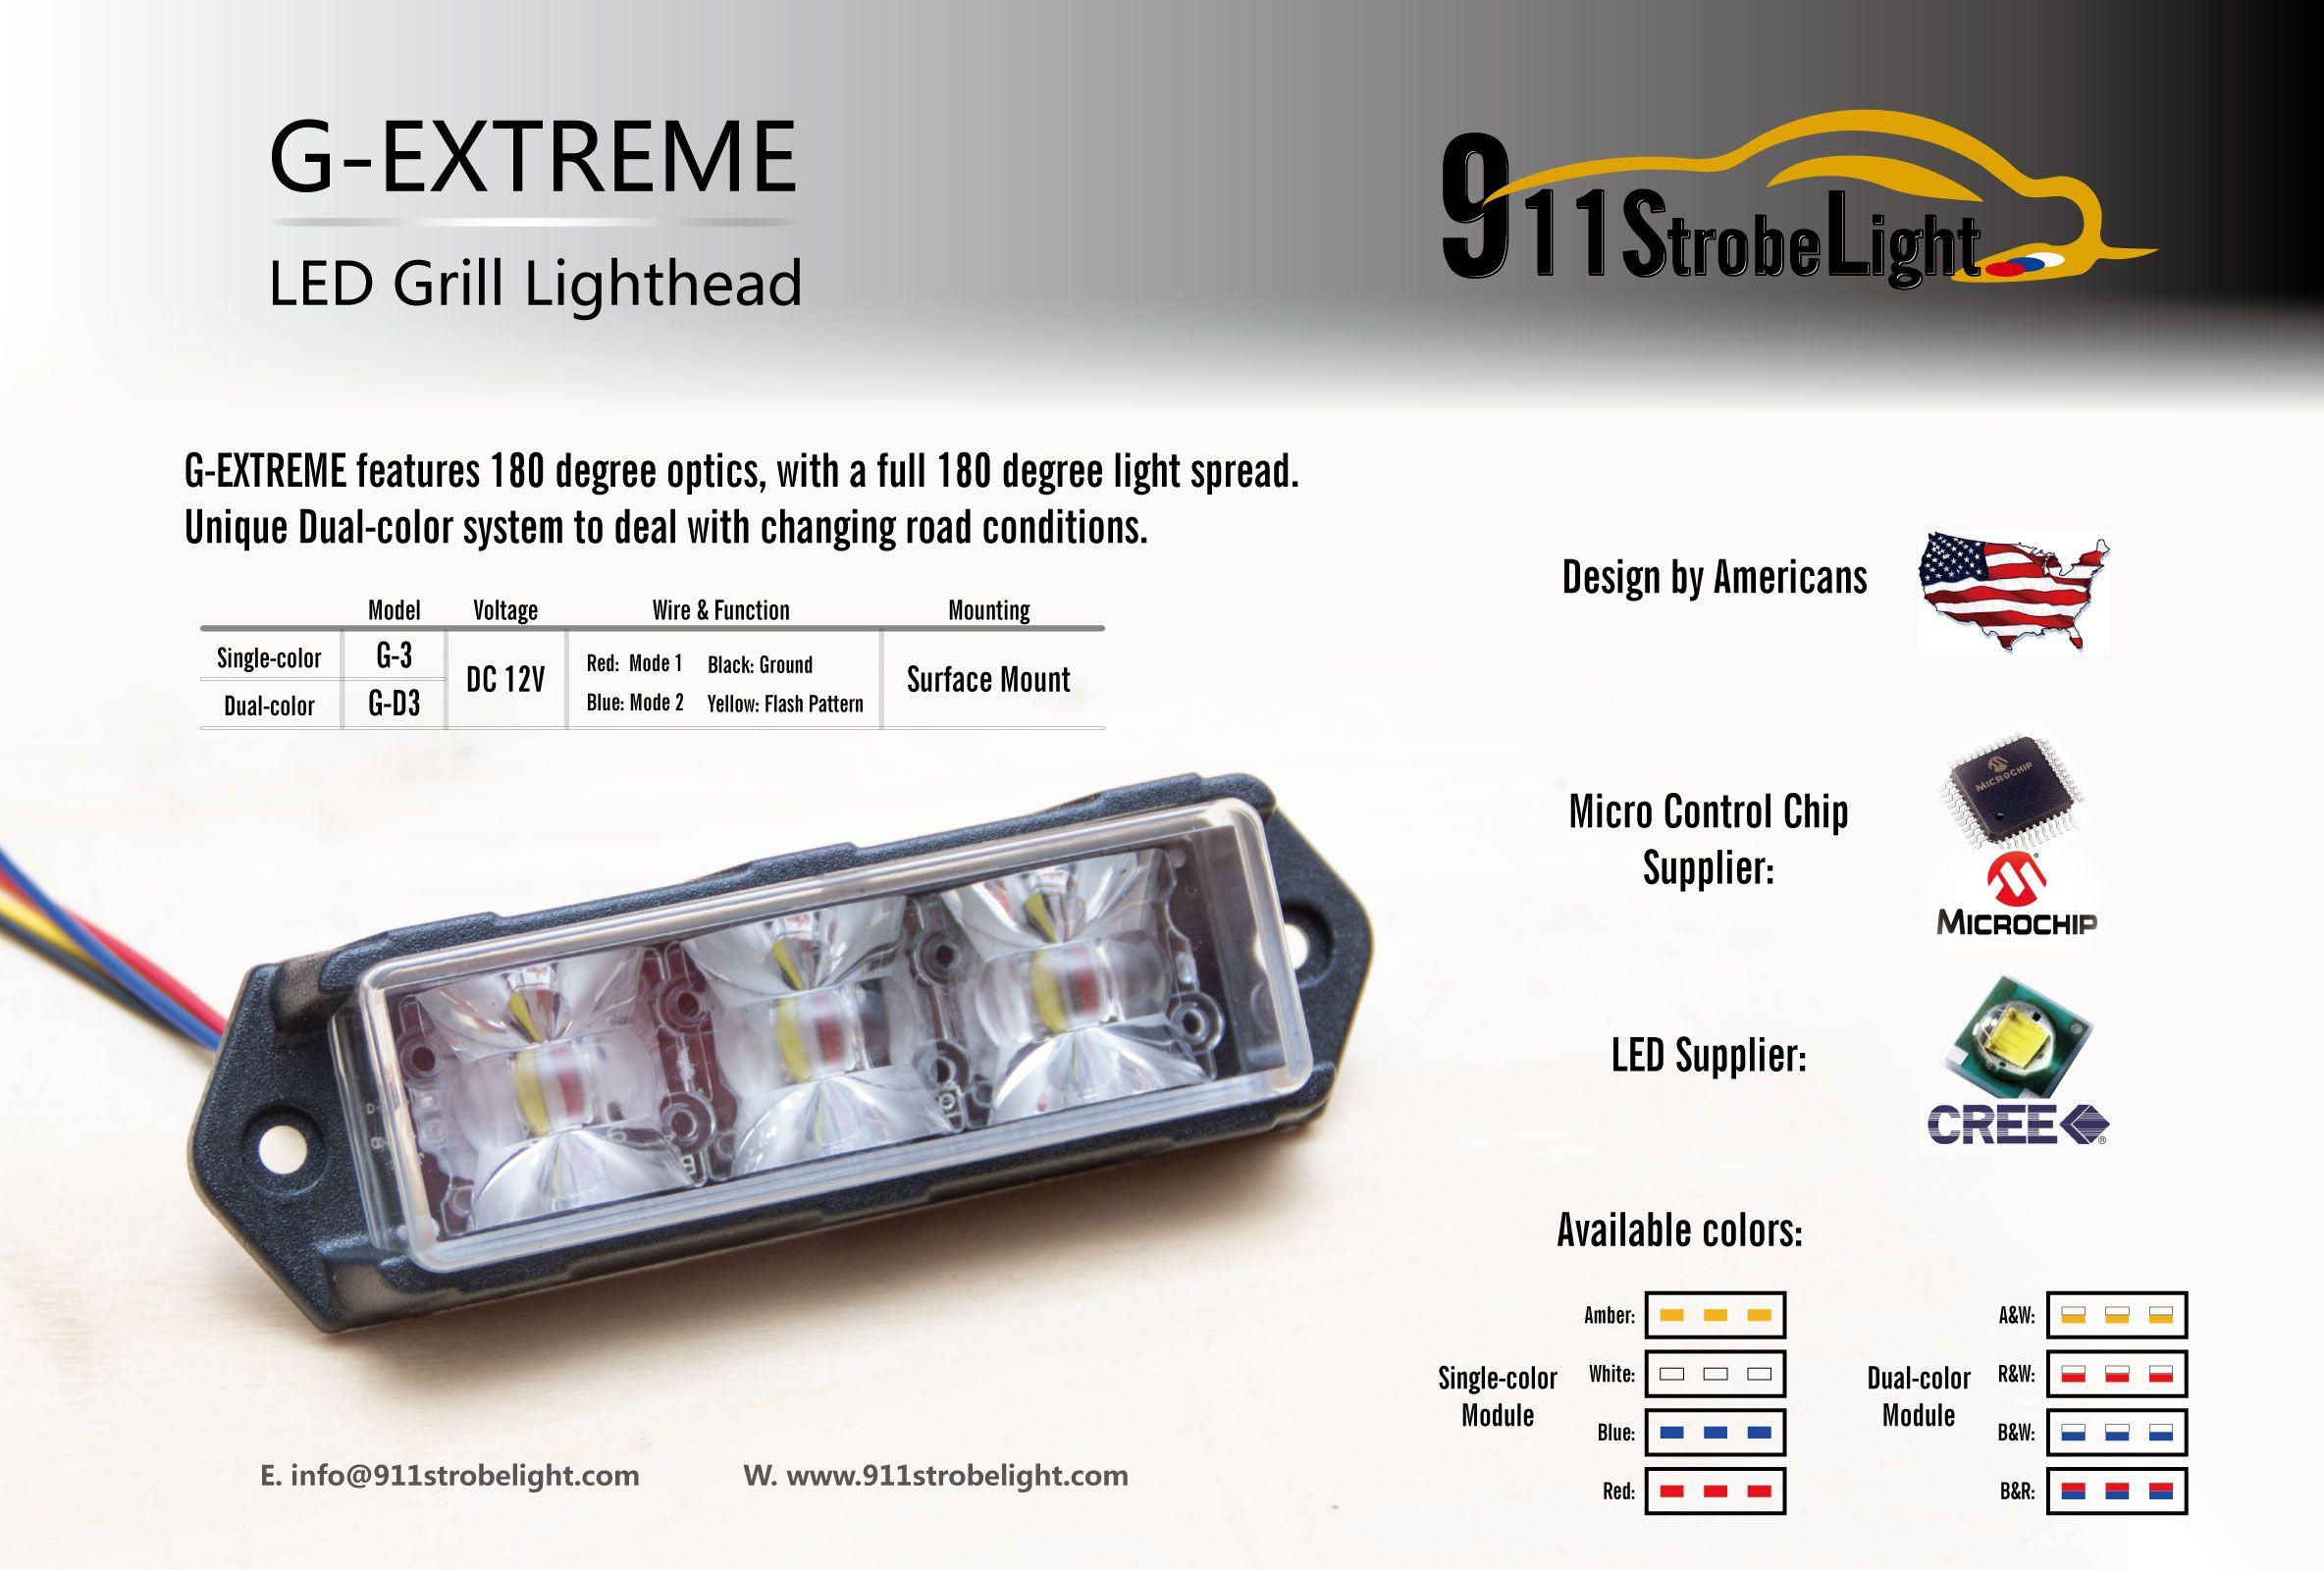 G-Extreme LED LED Strobe Light Light, LED 3W LED, LIGHTHHEAD LIGHTHHEAD LIGHTHHEAD, 12-24V SYSTEM DUAL-COLOR, Light 180 ° Widoczne ostrzeżenie.